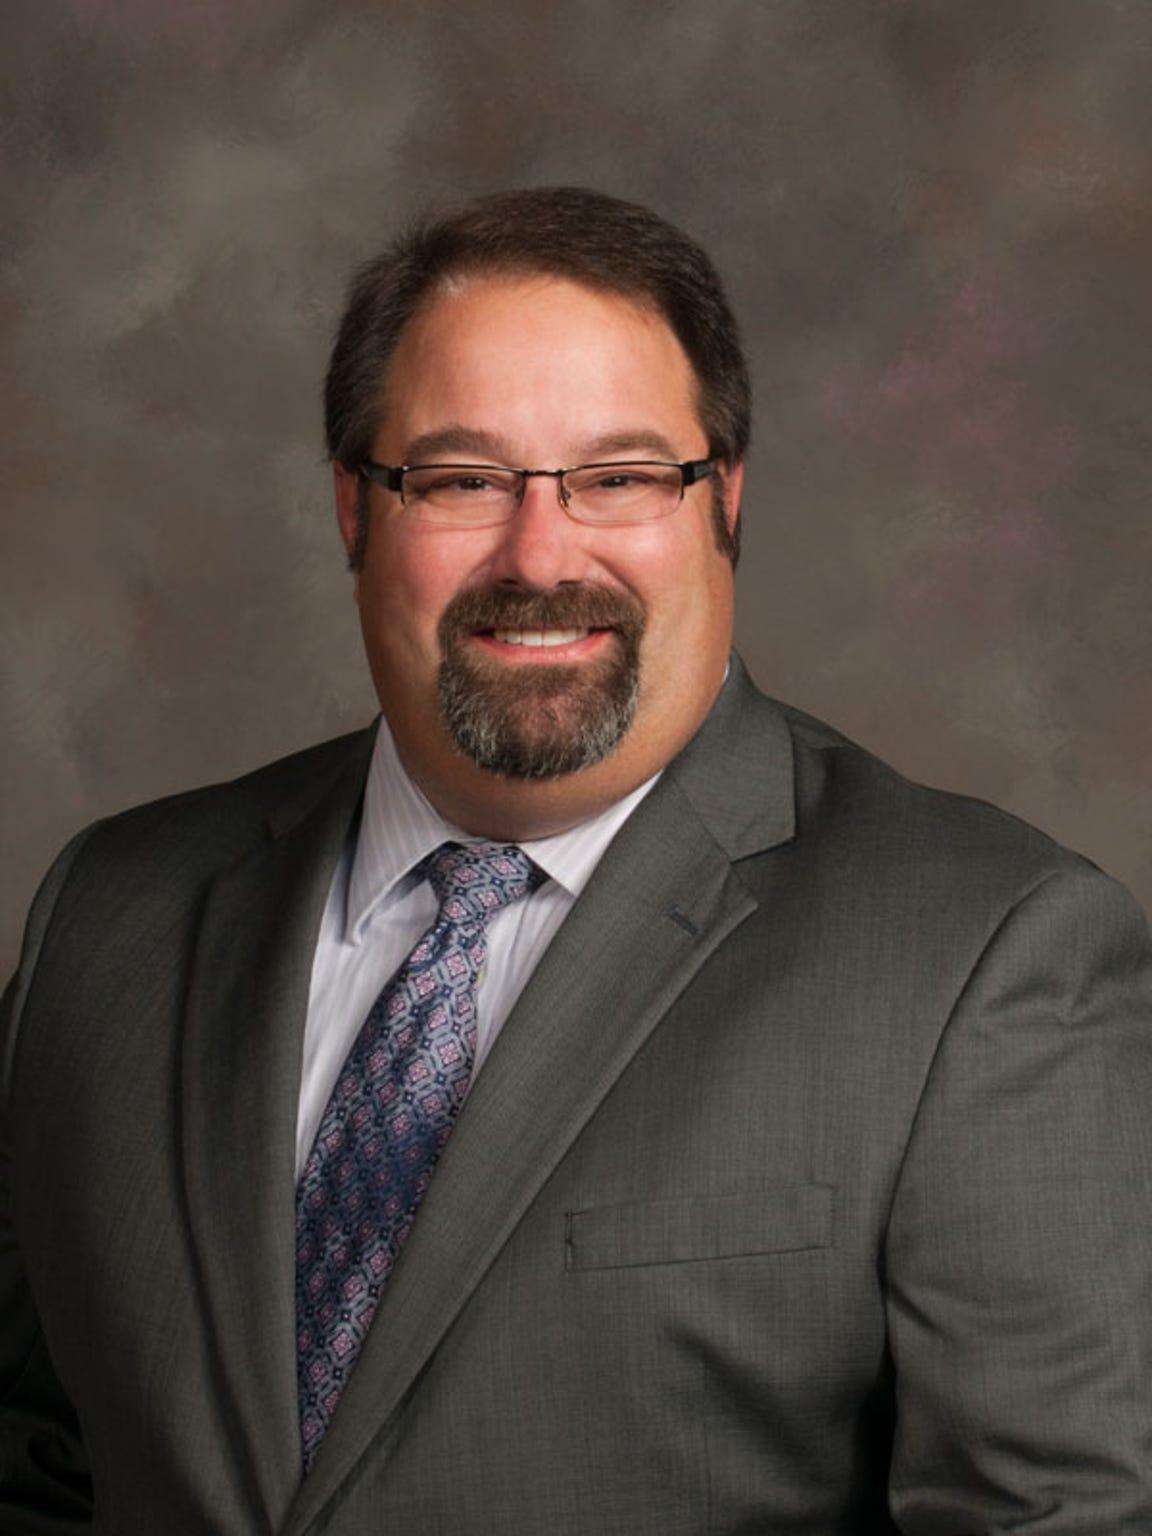 Ken Schilz, Nebraska state senator, 47th District